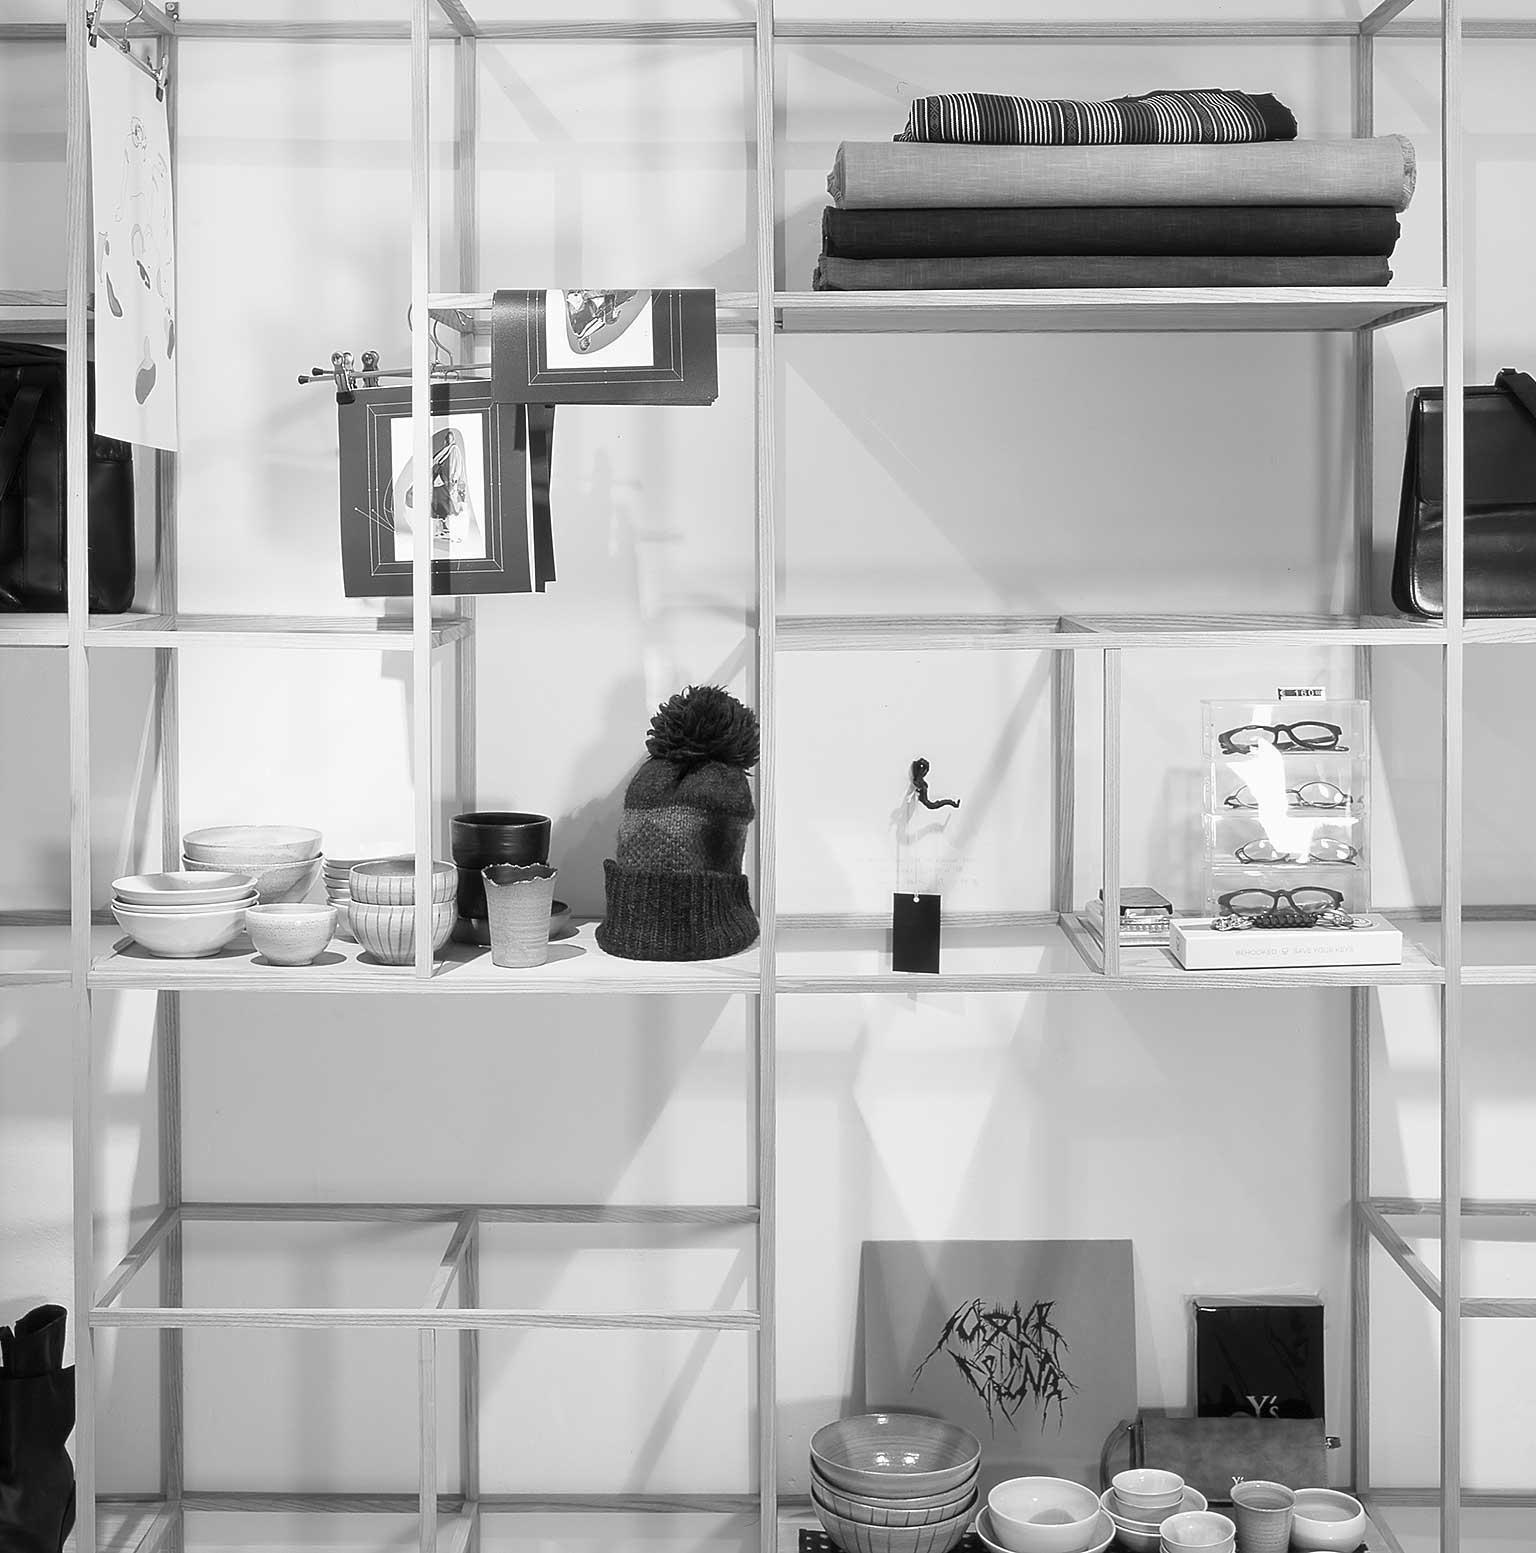 Bluesleeve concept store